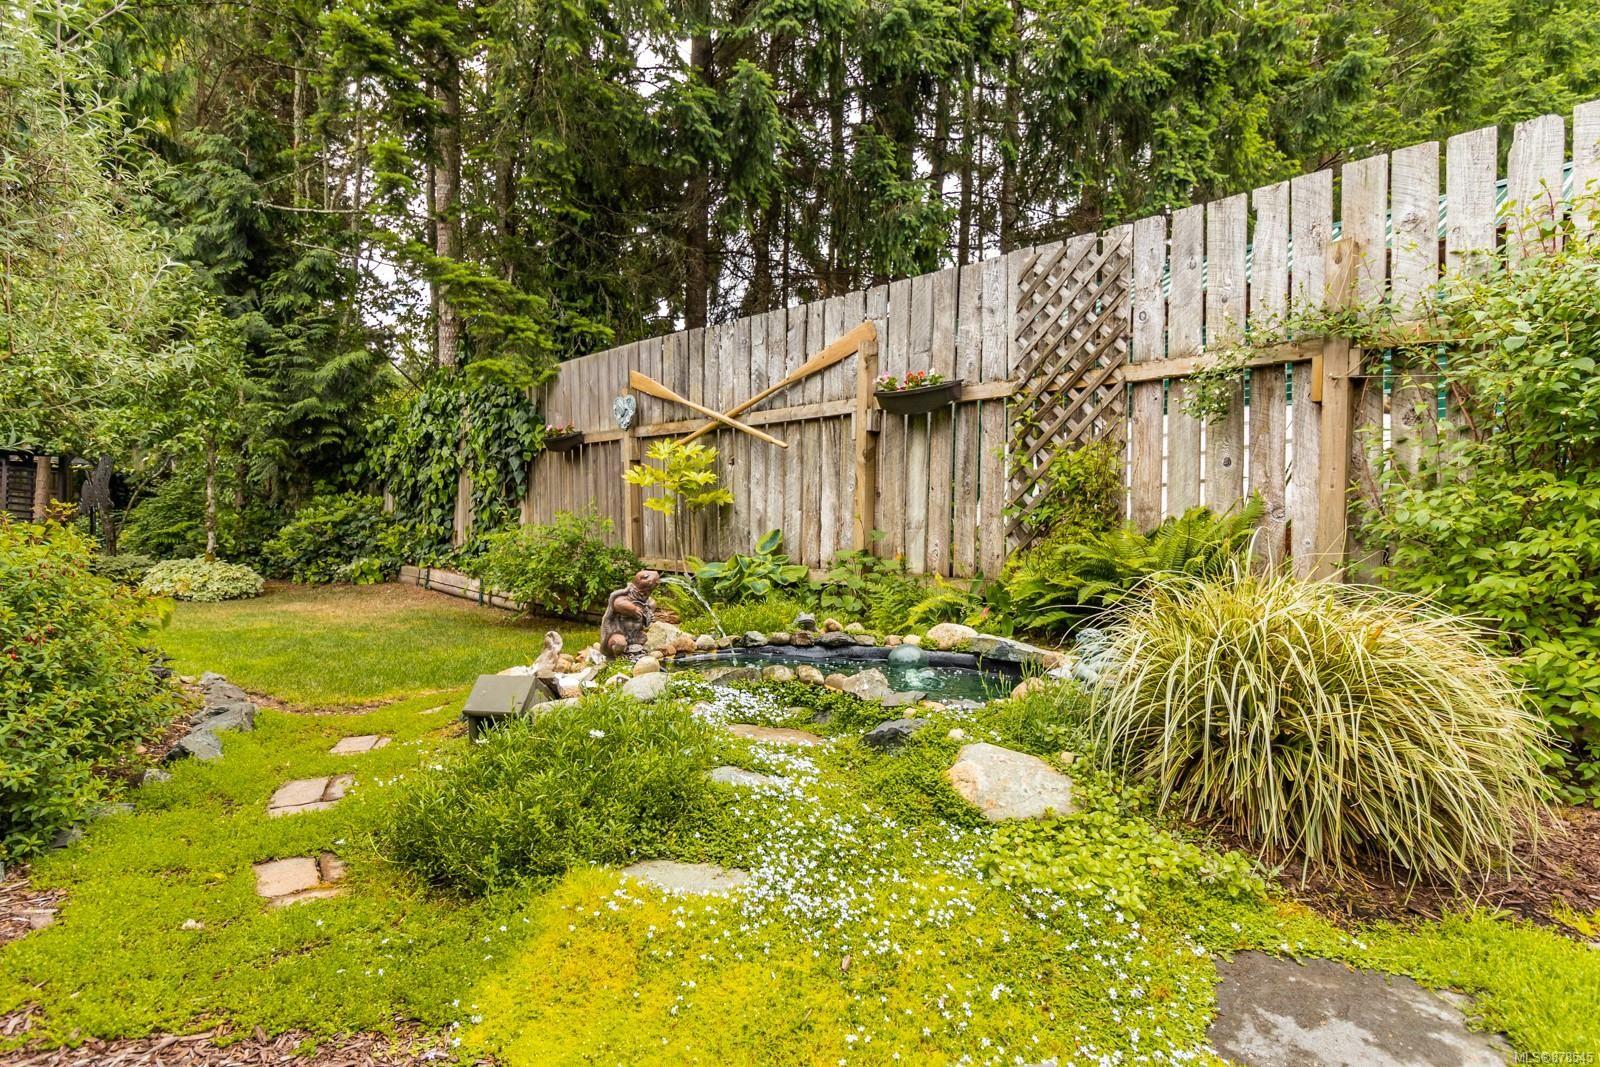 Photo 27: Photos: 1070 Symons Cres in : PQ Qualicum Beach House for sale (Parksville/Qualicum)  : MLS®# 878545